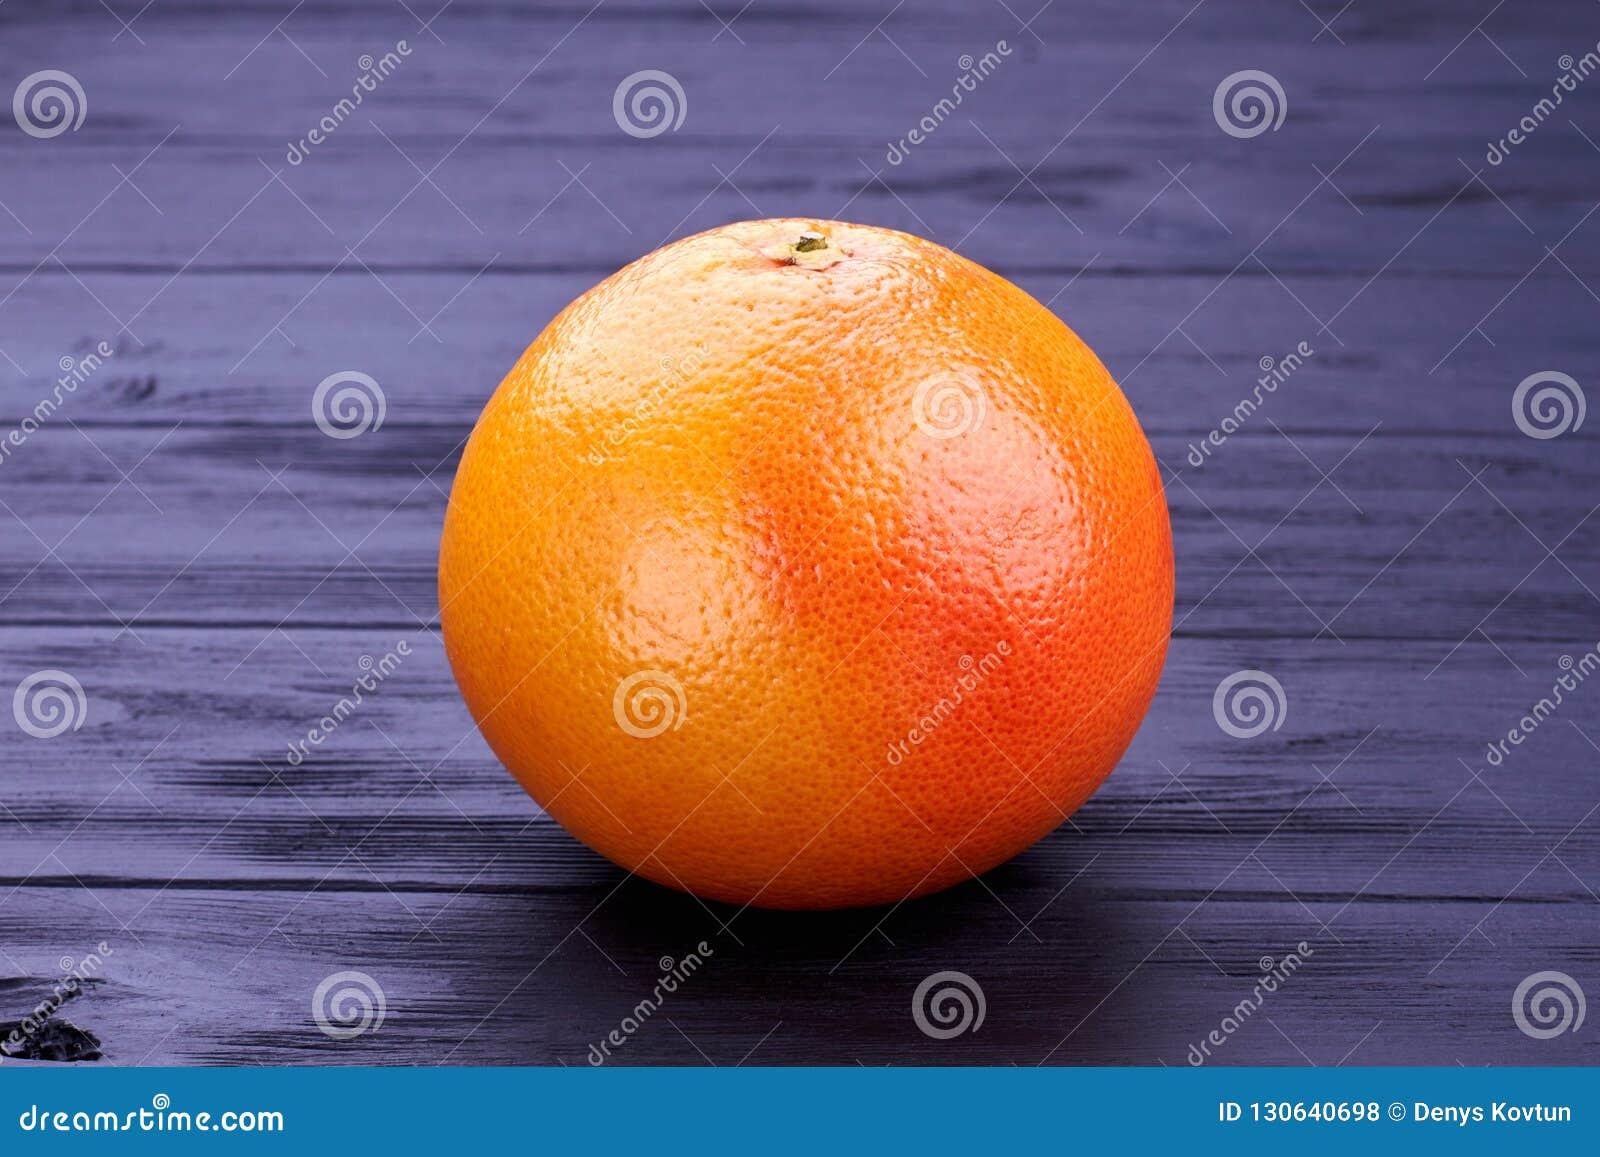 Gehele verse grapefruit op donker hout